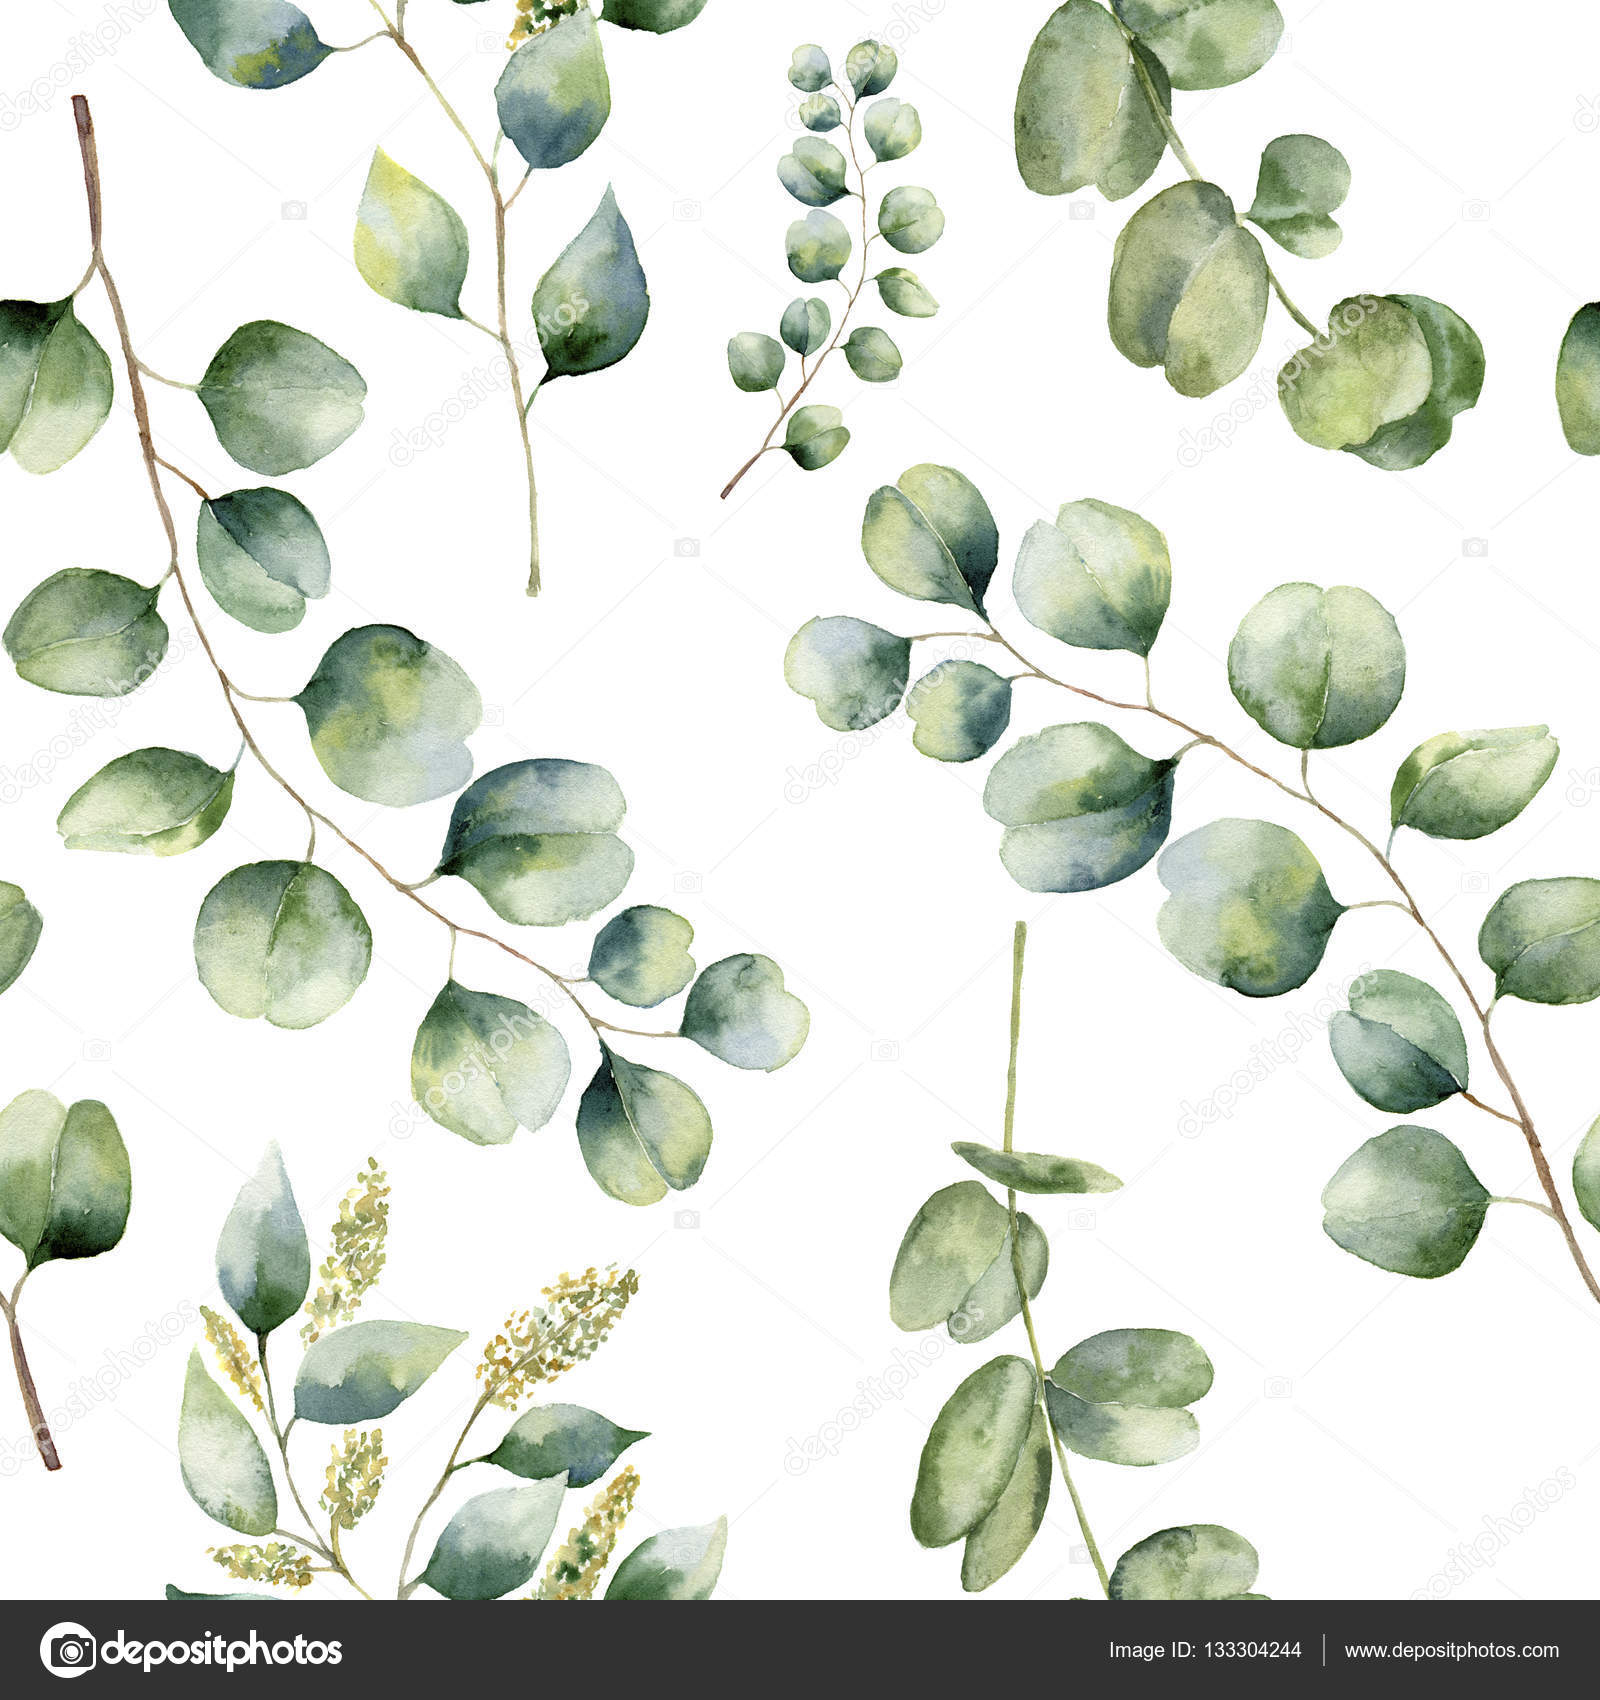 aquarell blumenmuster mit eukalyptus verl sst handgemalte. Black Bedroom Furniture Sets. Home Design Ideas